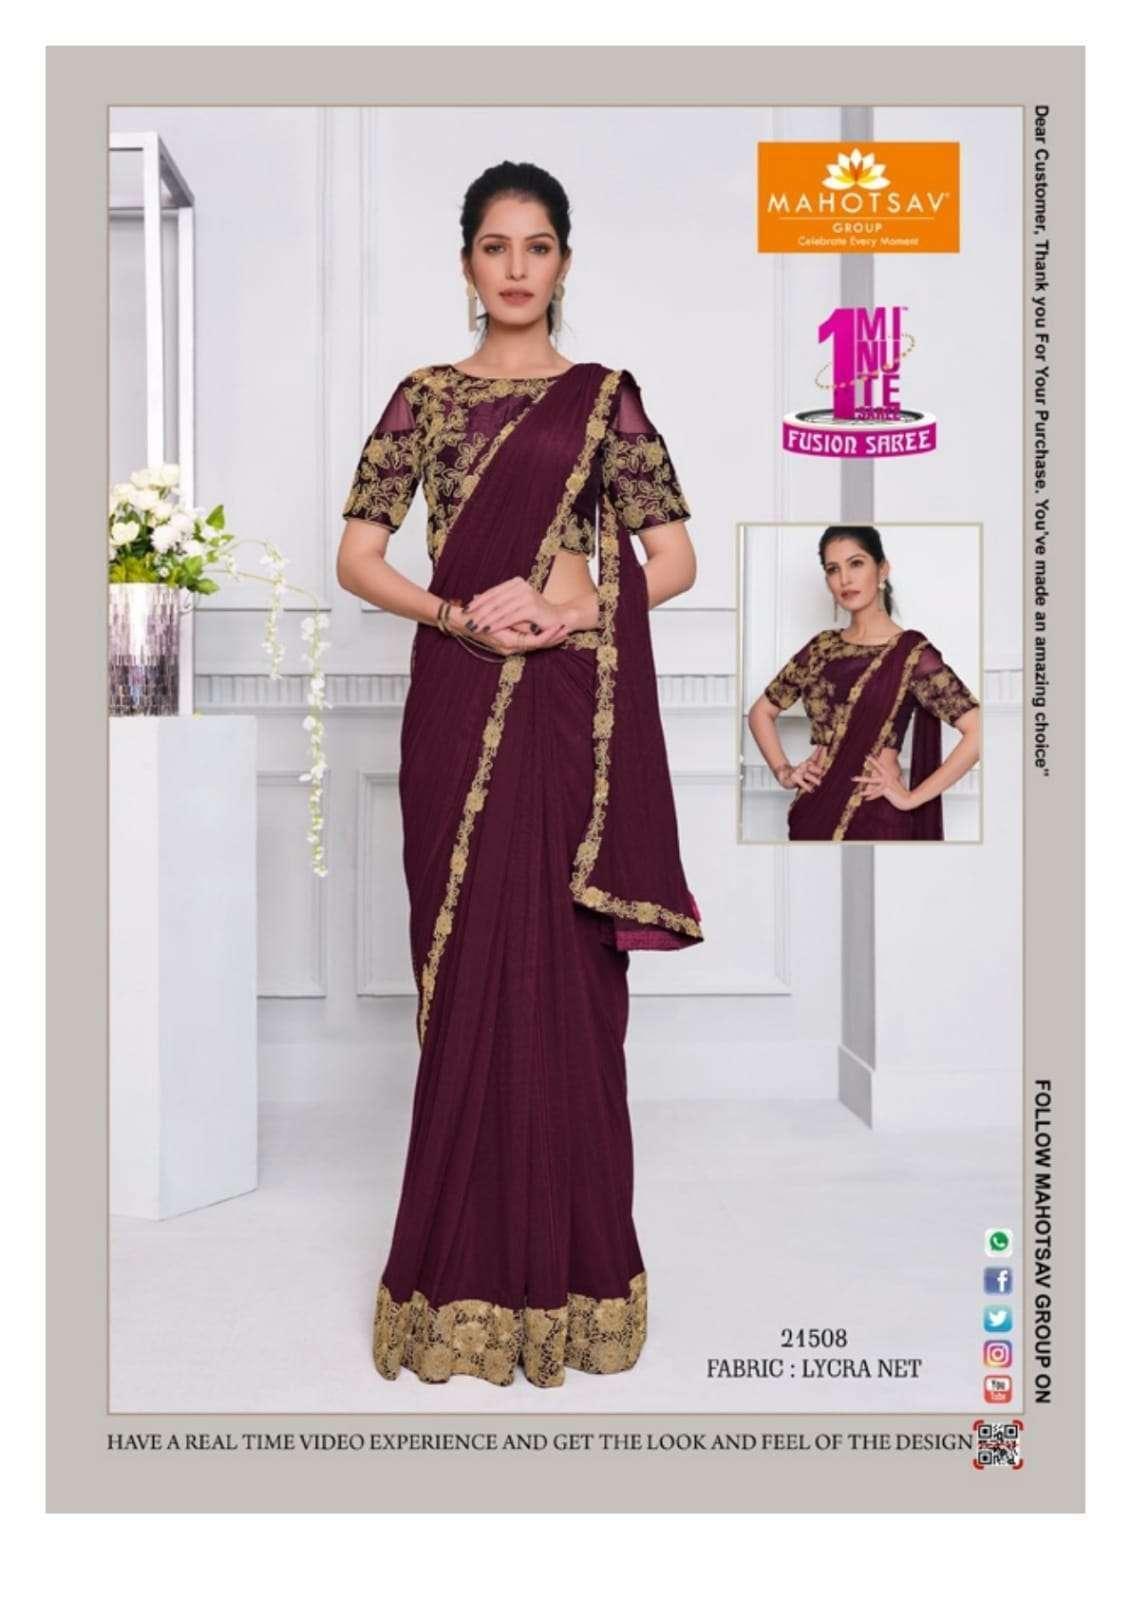 Mahotsav Moh Manthan Izzara 21501 To 215018 Series Fancy Designer Sarees Collection 215083035